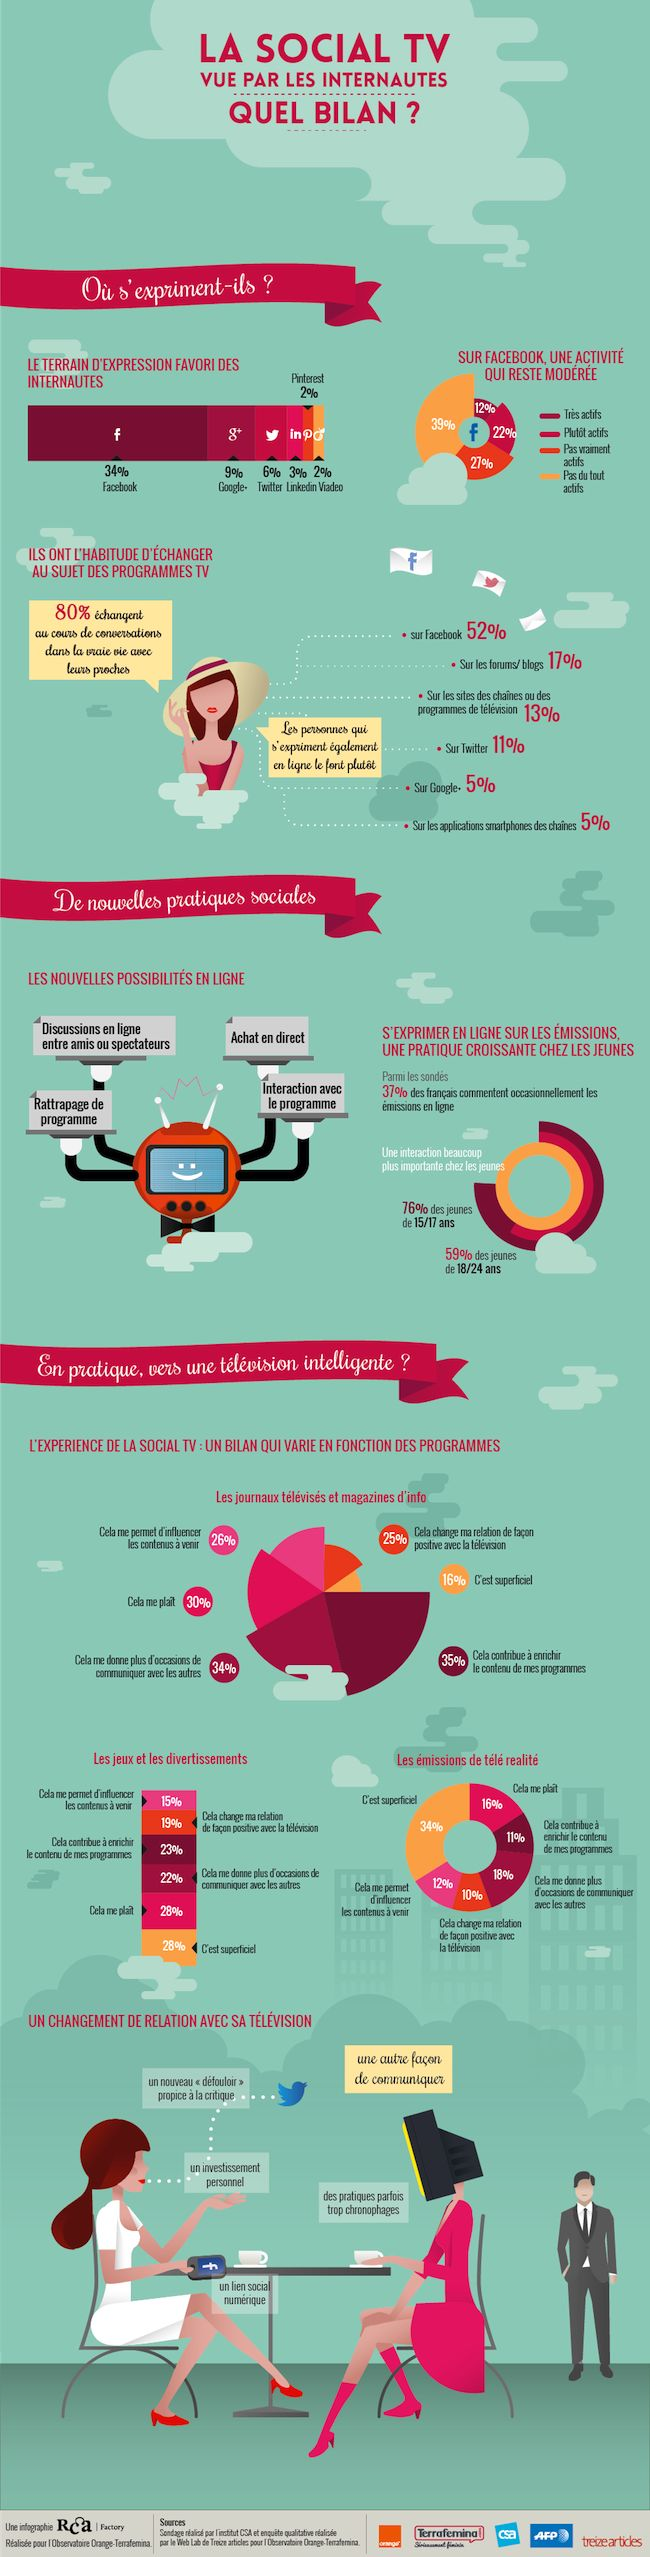 infographie_socialtv_version web_v2